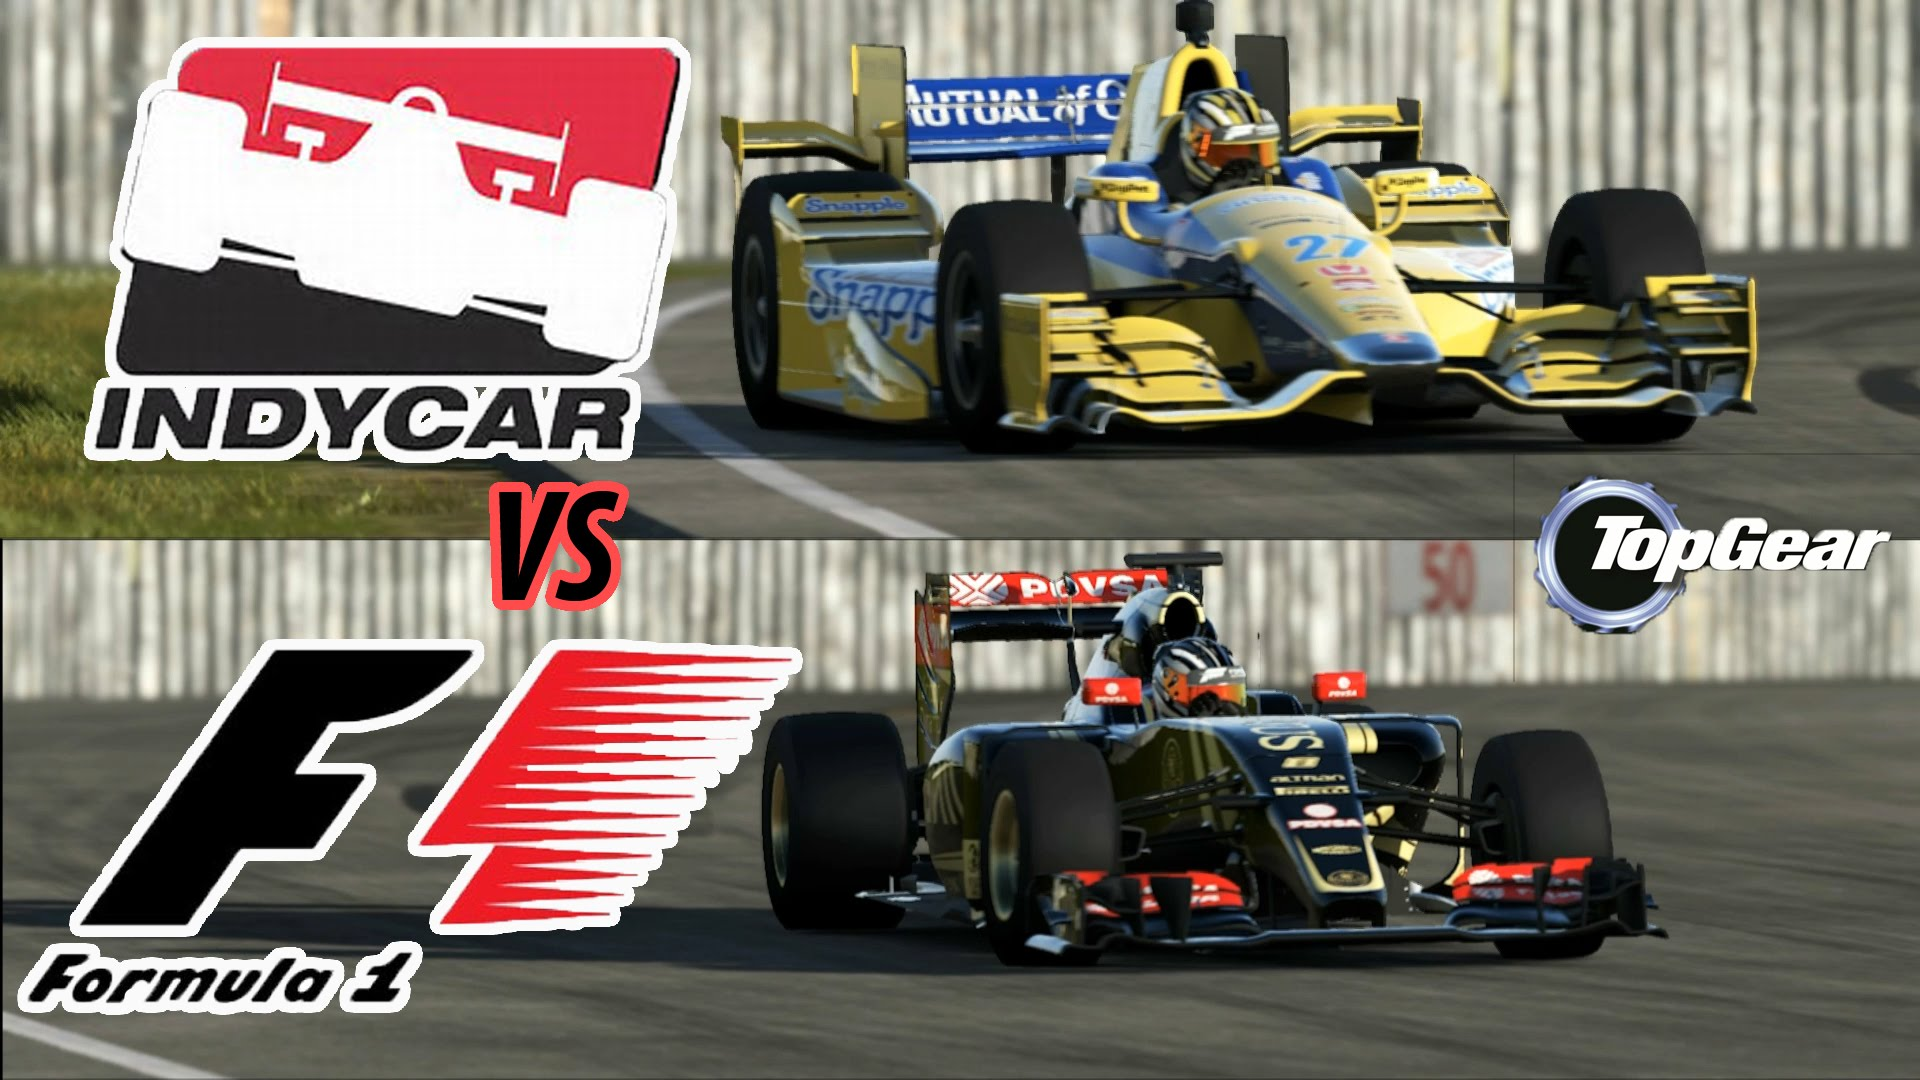 Formula 1 vs IndyCar